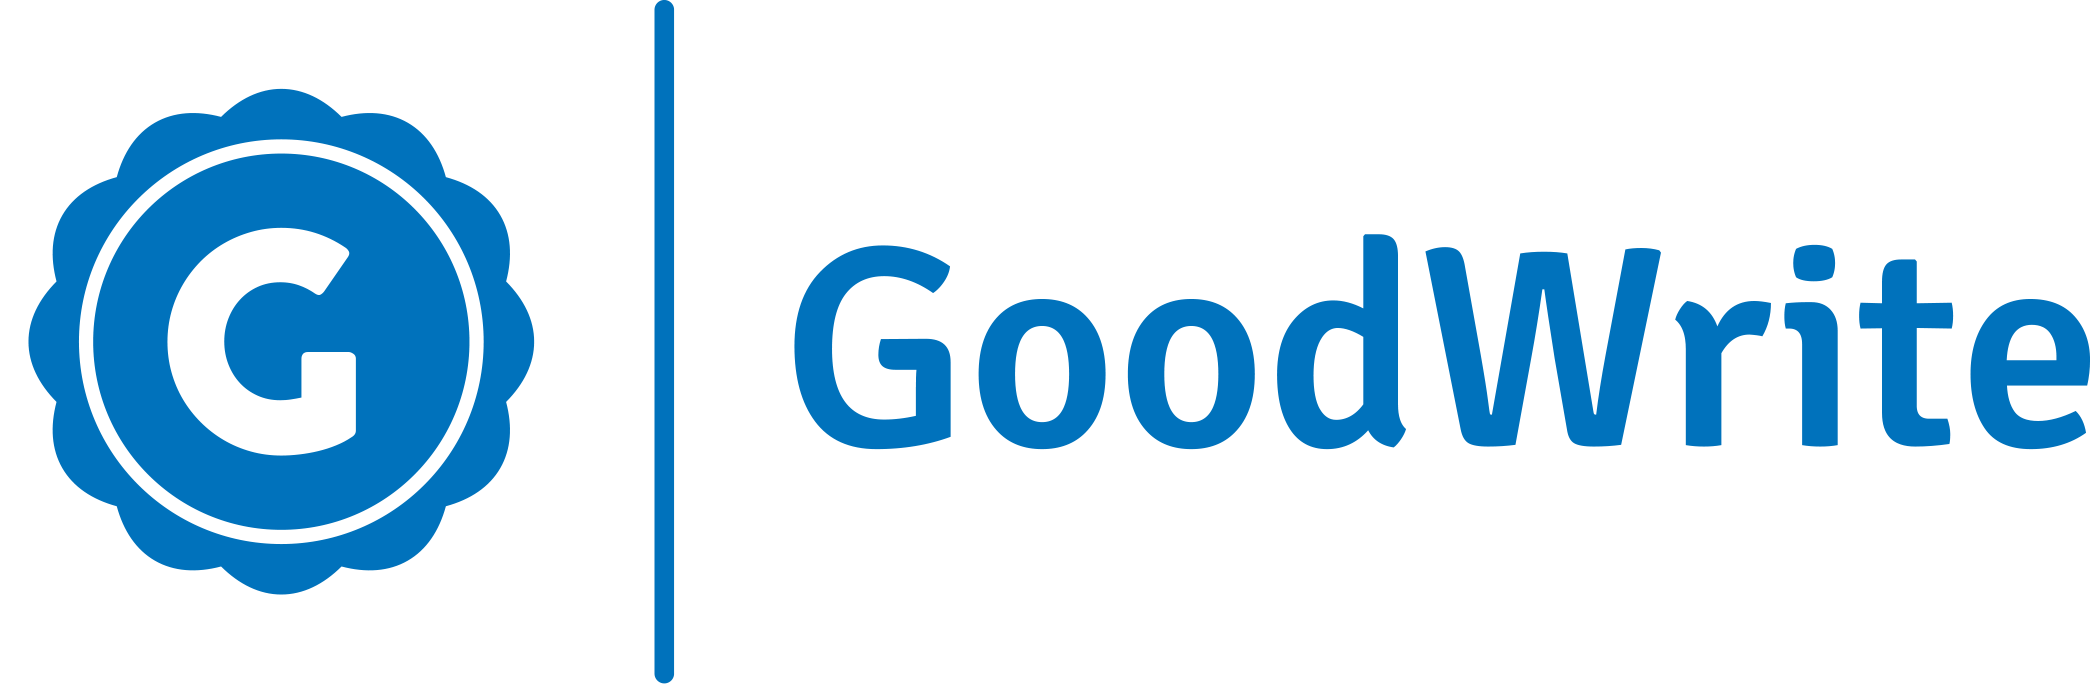 goodwrite_logo_transp_poziom